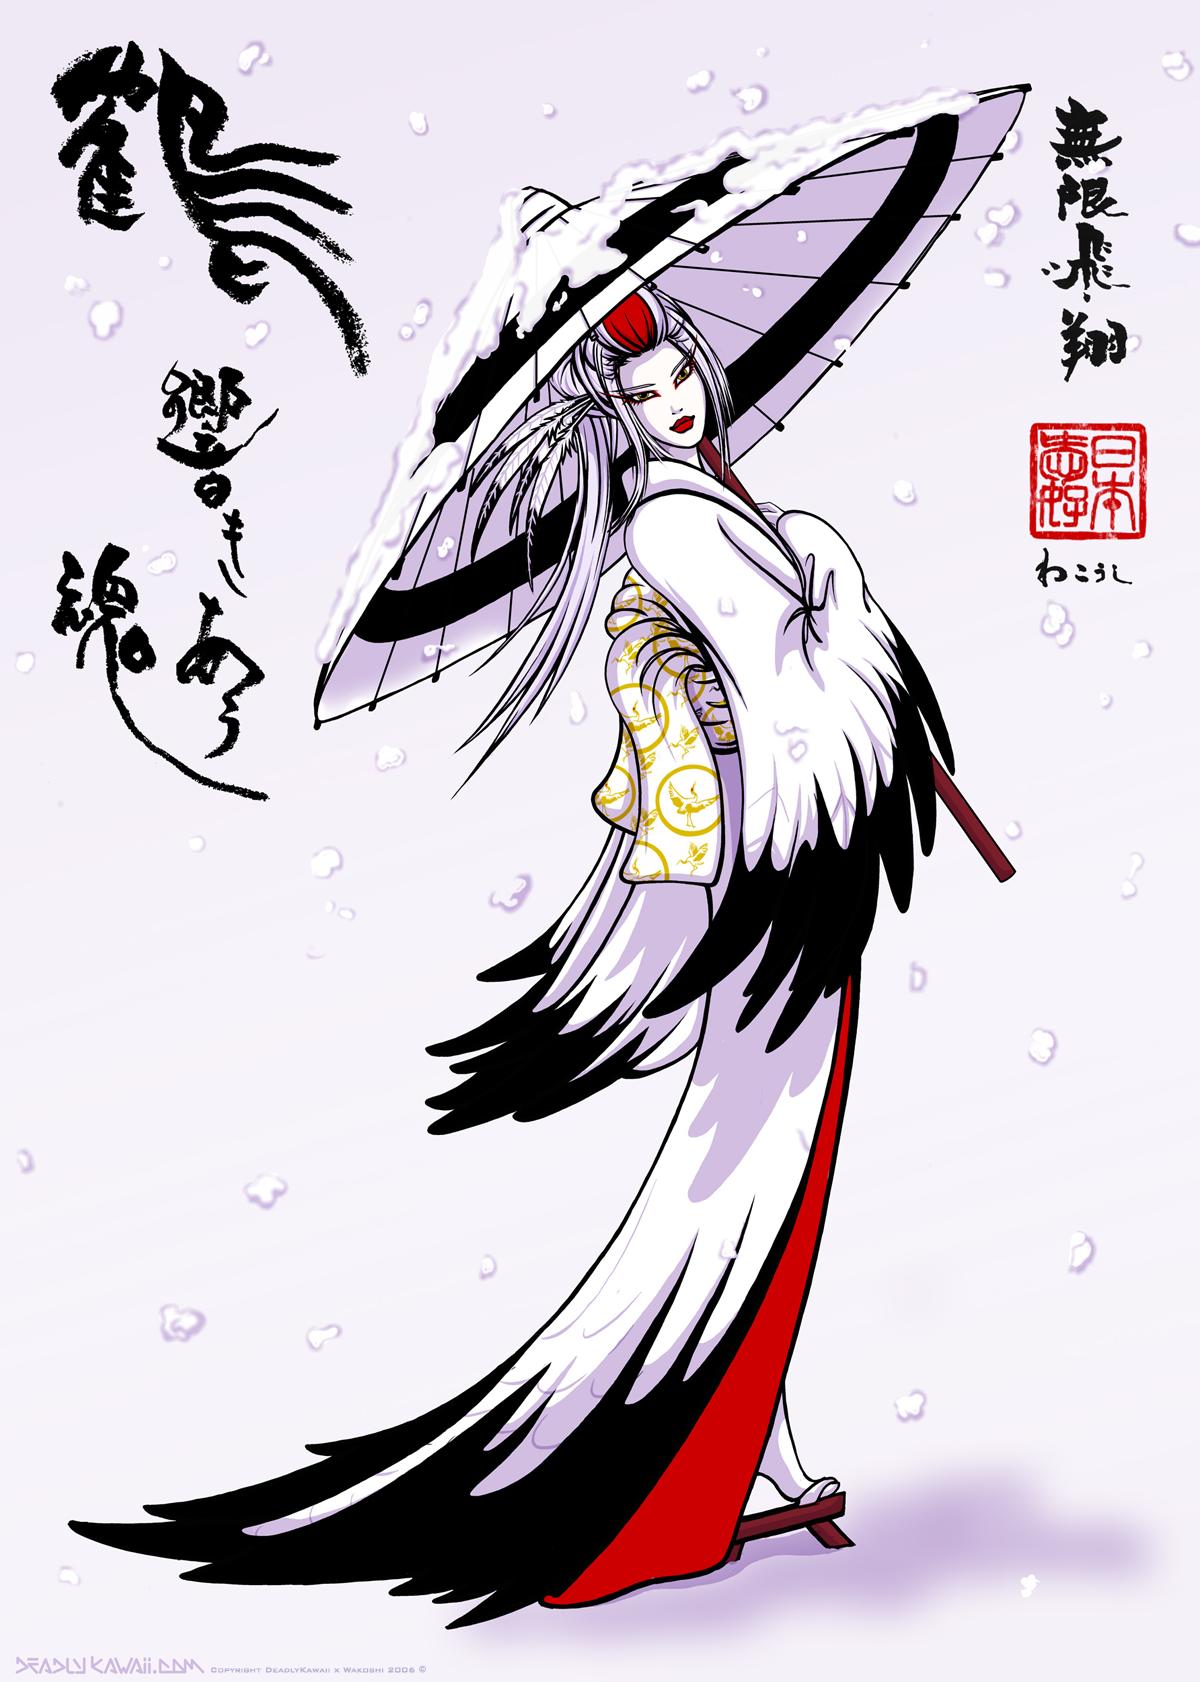 Grateful-Crane-by-DeadlyKawaii-x-Wakoshi.png